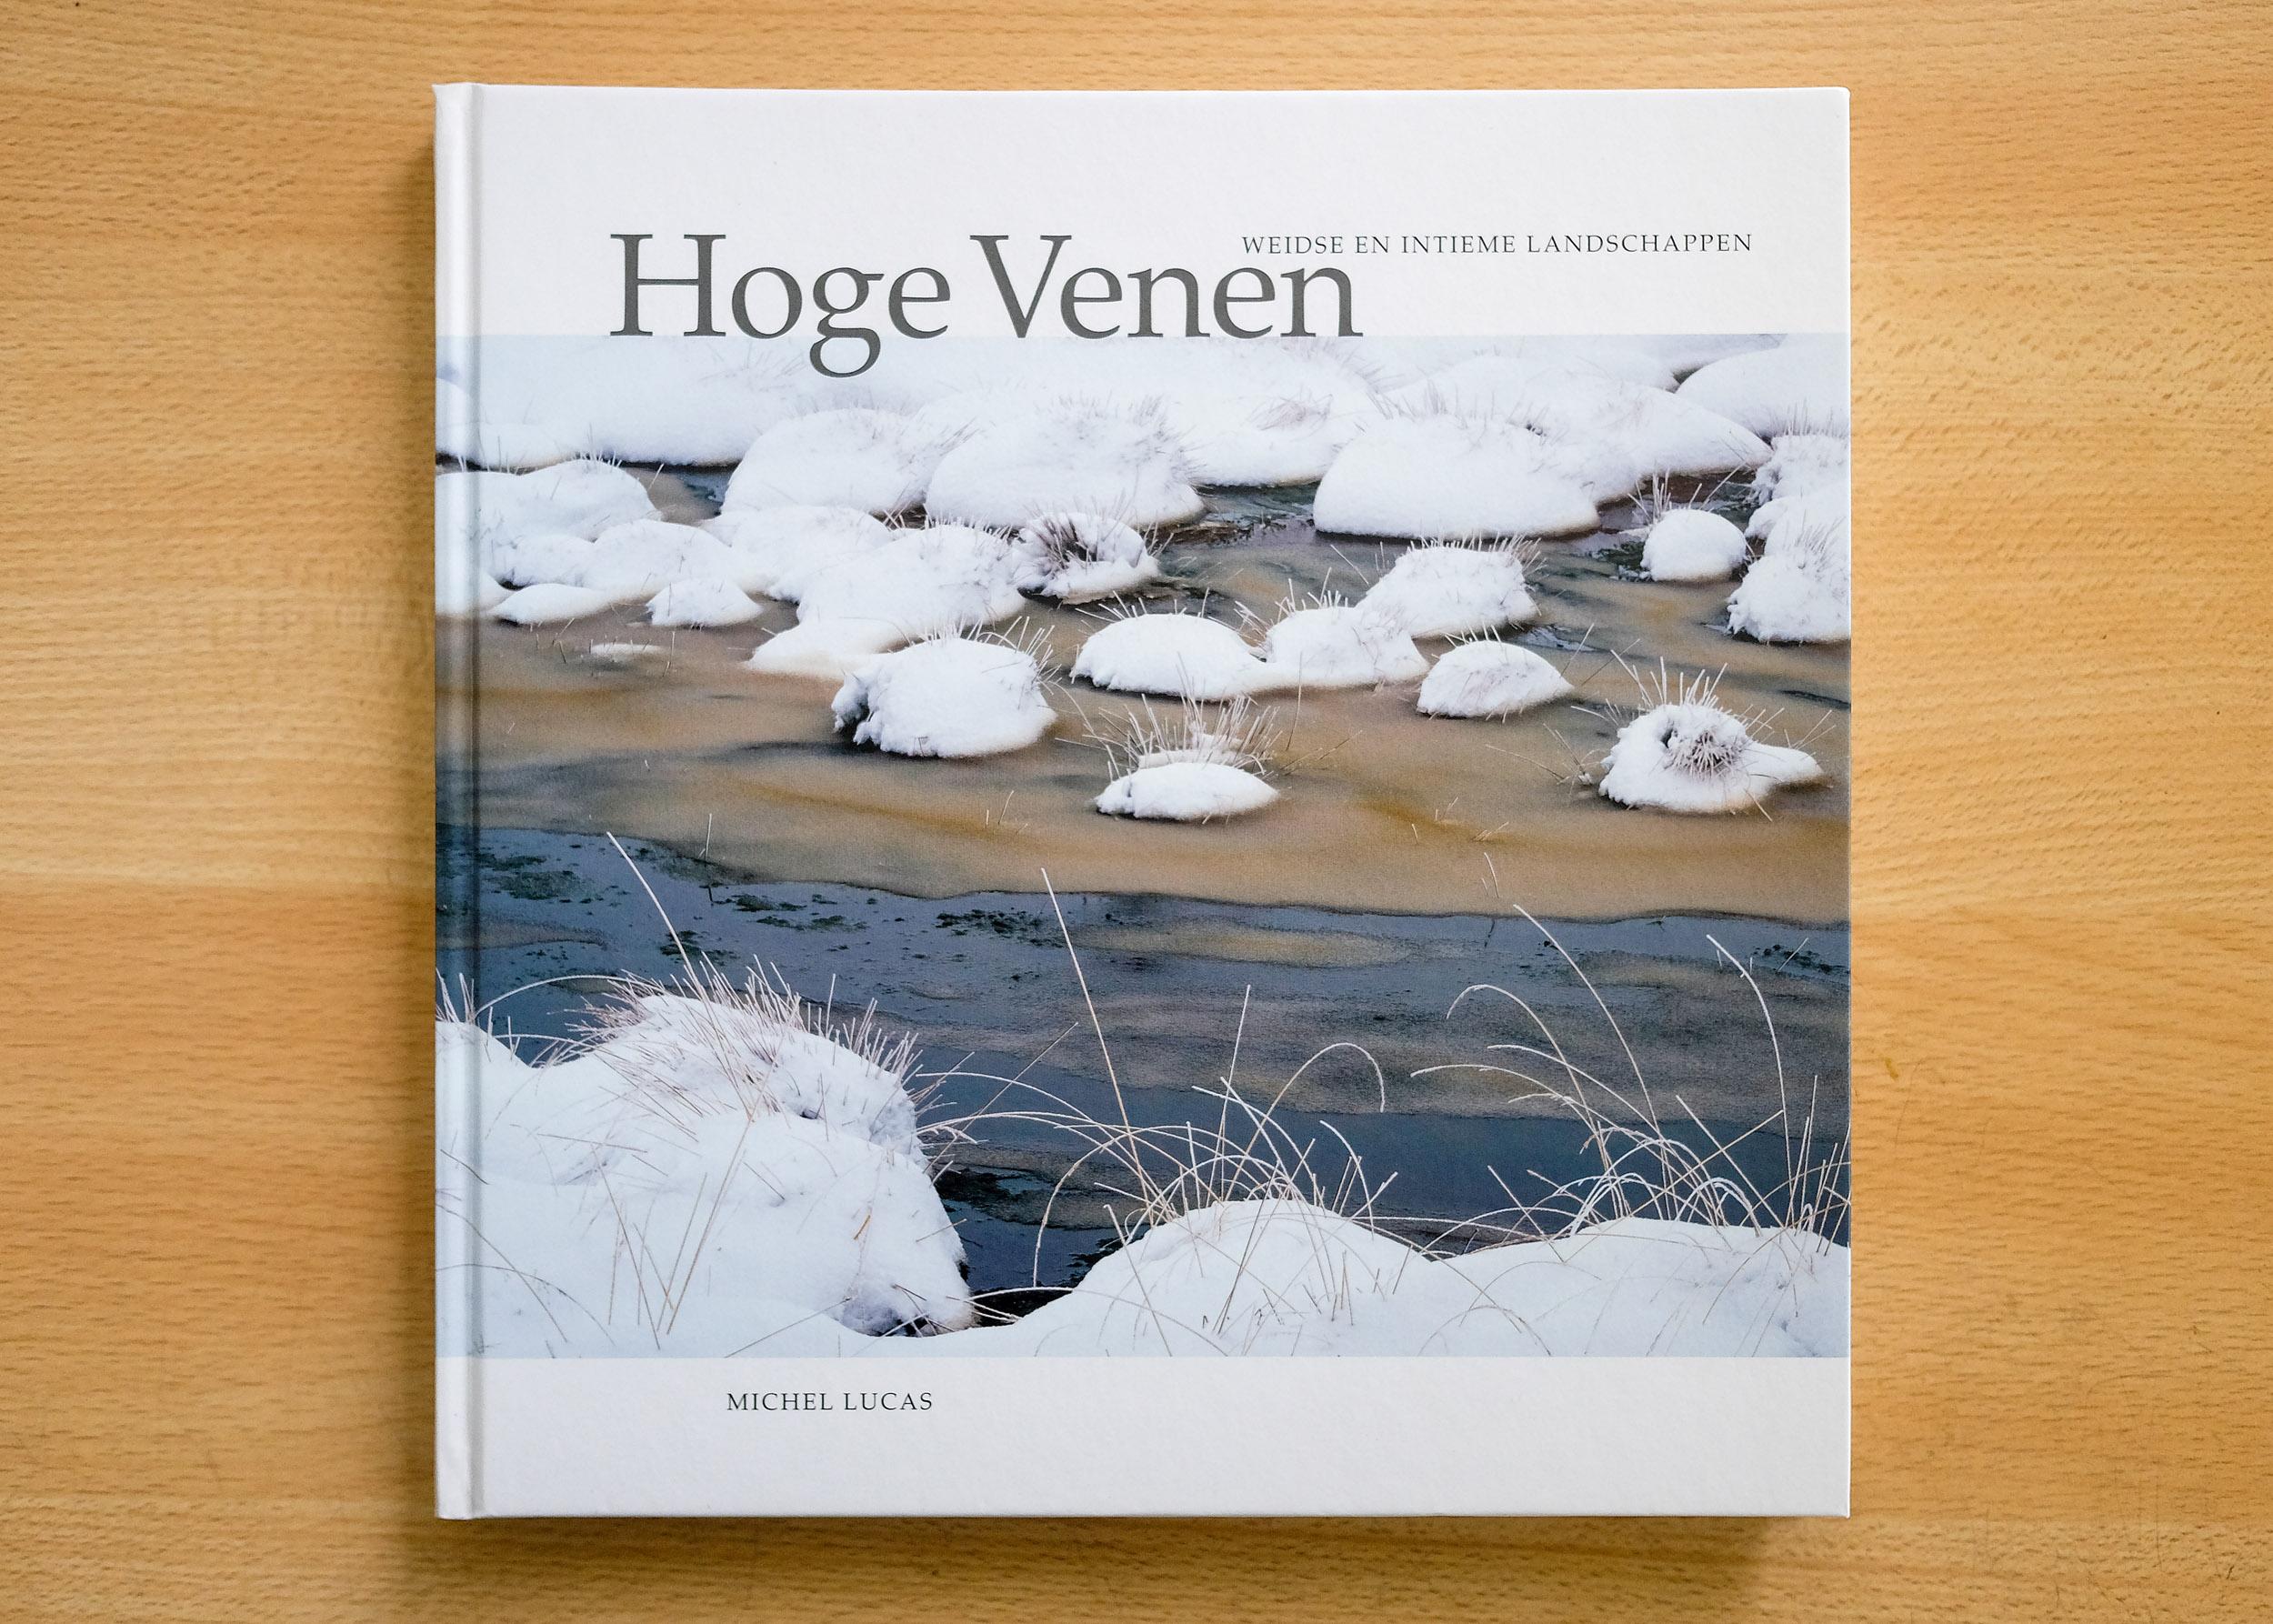 Boekreview-Glenn-Vanderbeke-De-Hoge-Venen-Michel-Lucas-DSF6246-uitgelicht.jpg